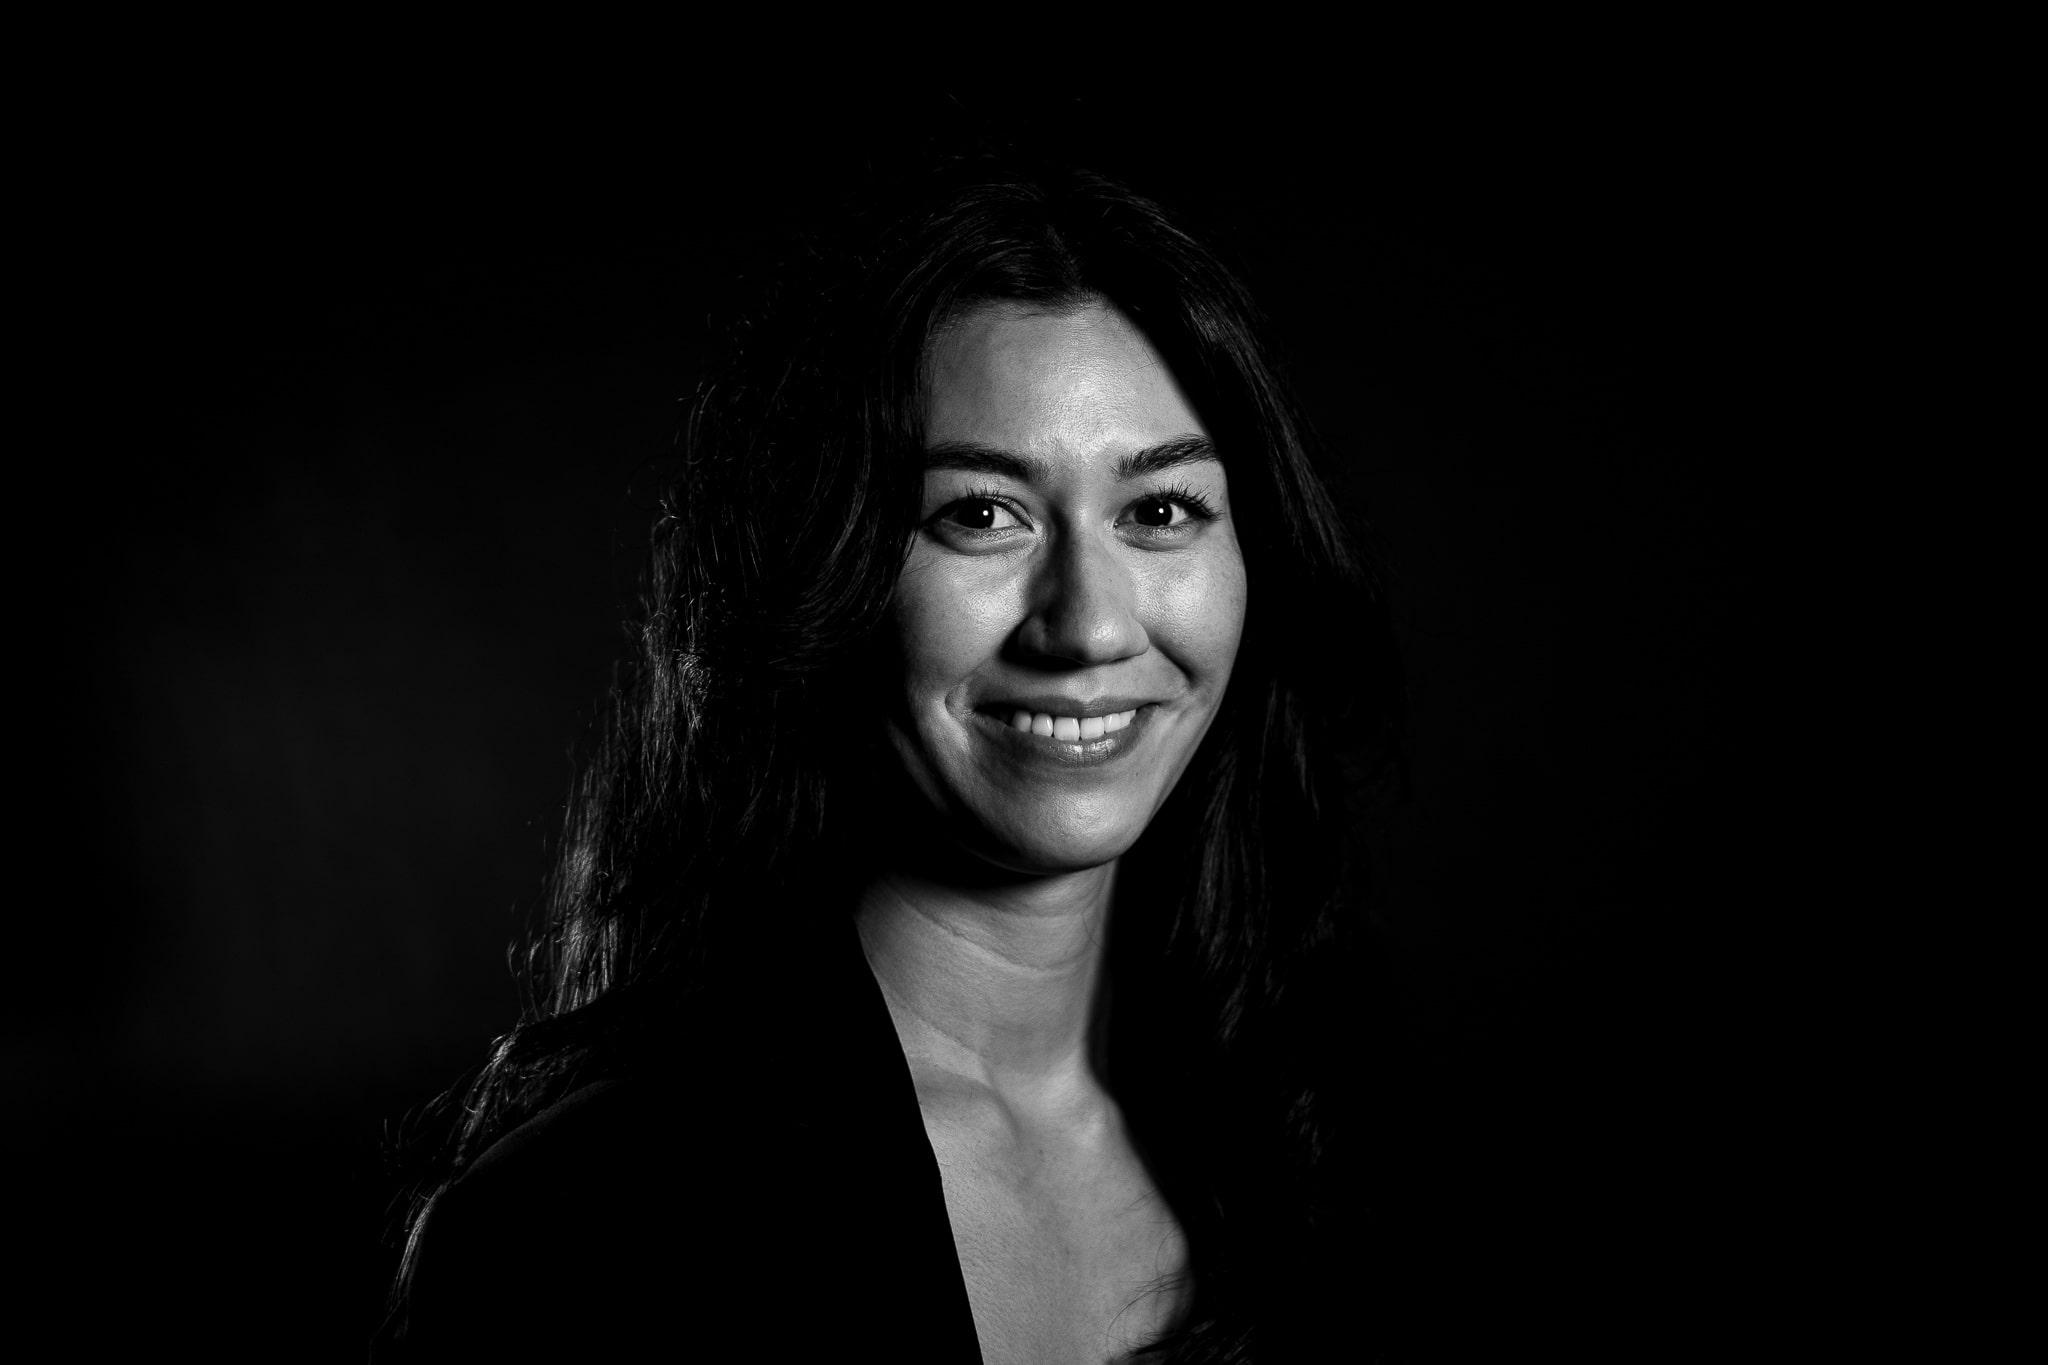 Marissa Hsu